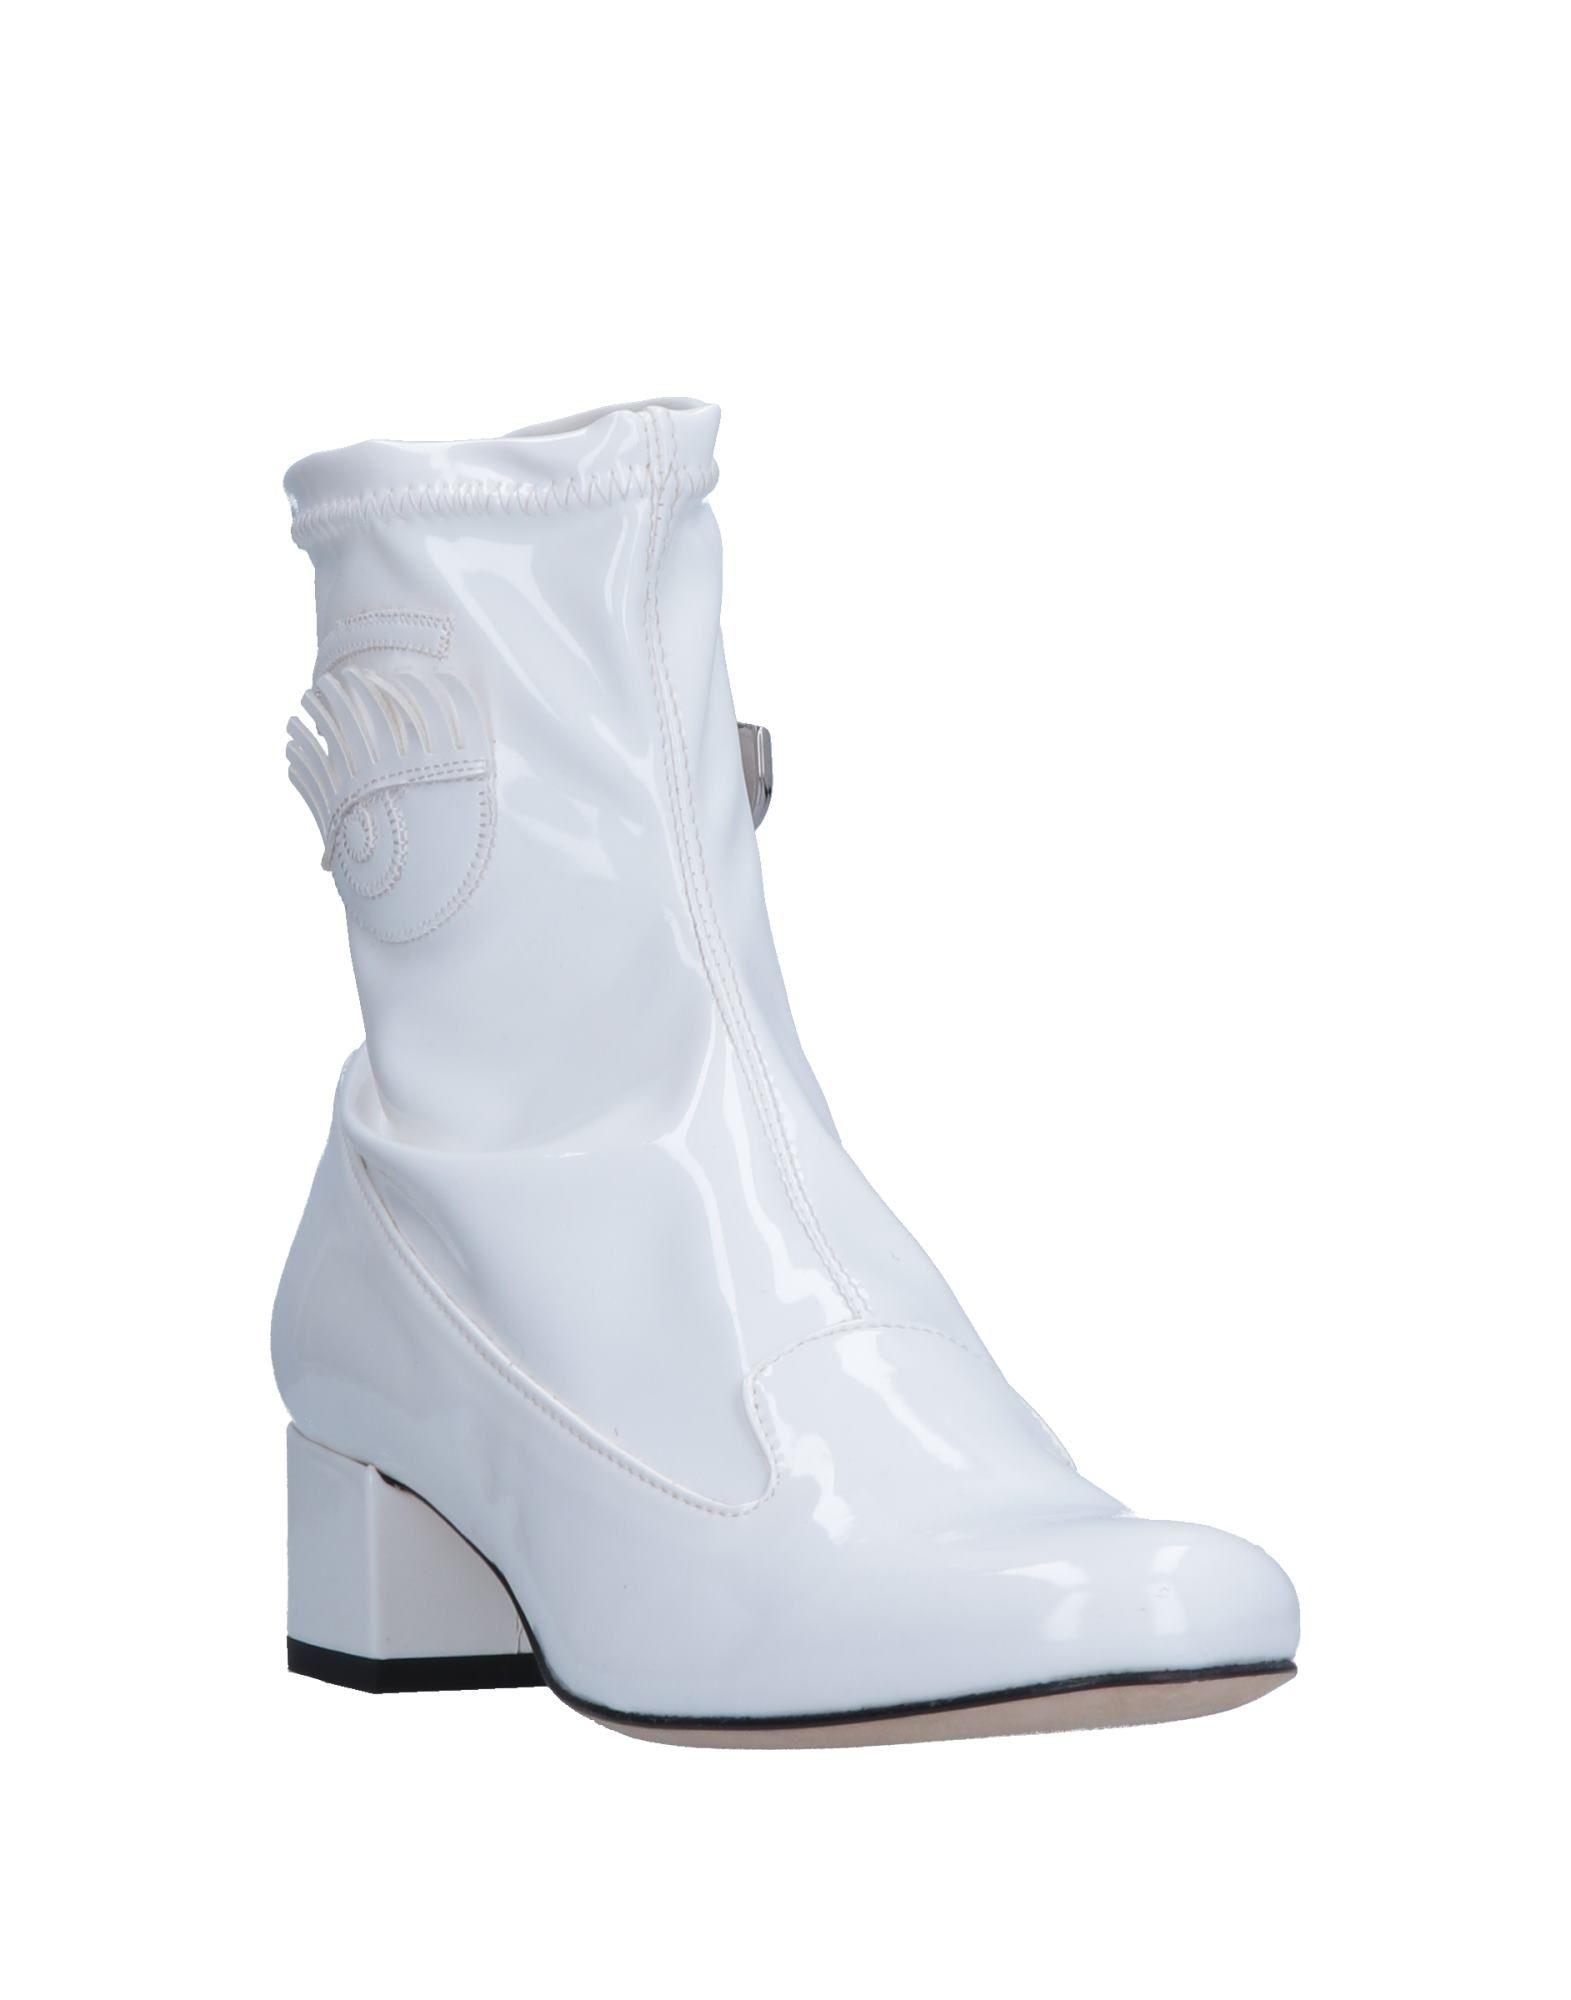 Chiara 11548440ILGut Ferragni Stiefelette Damen  11548440ILGut Chiara aussehende strapazierfähige Schuhe 534b5b